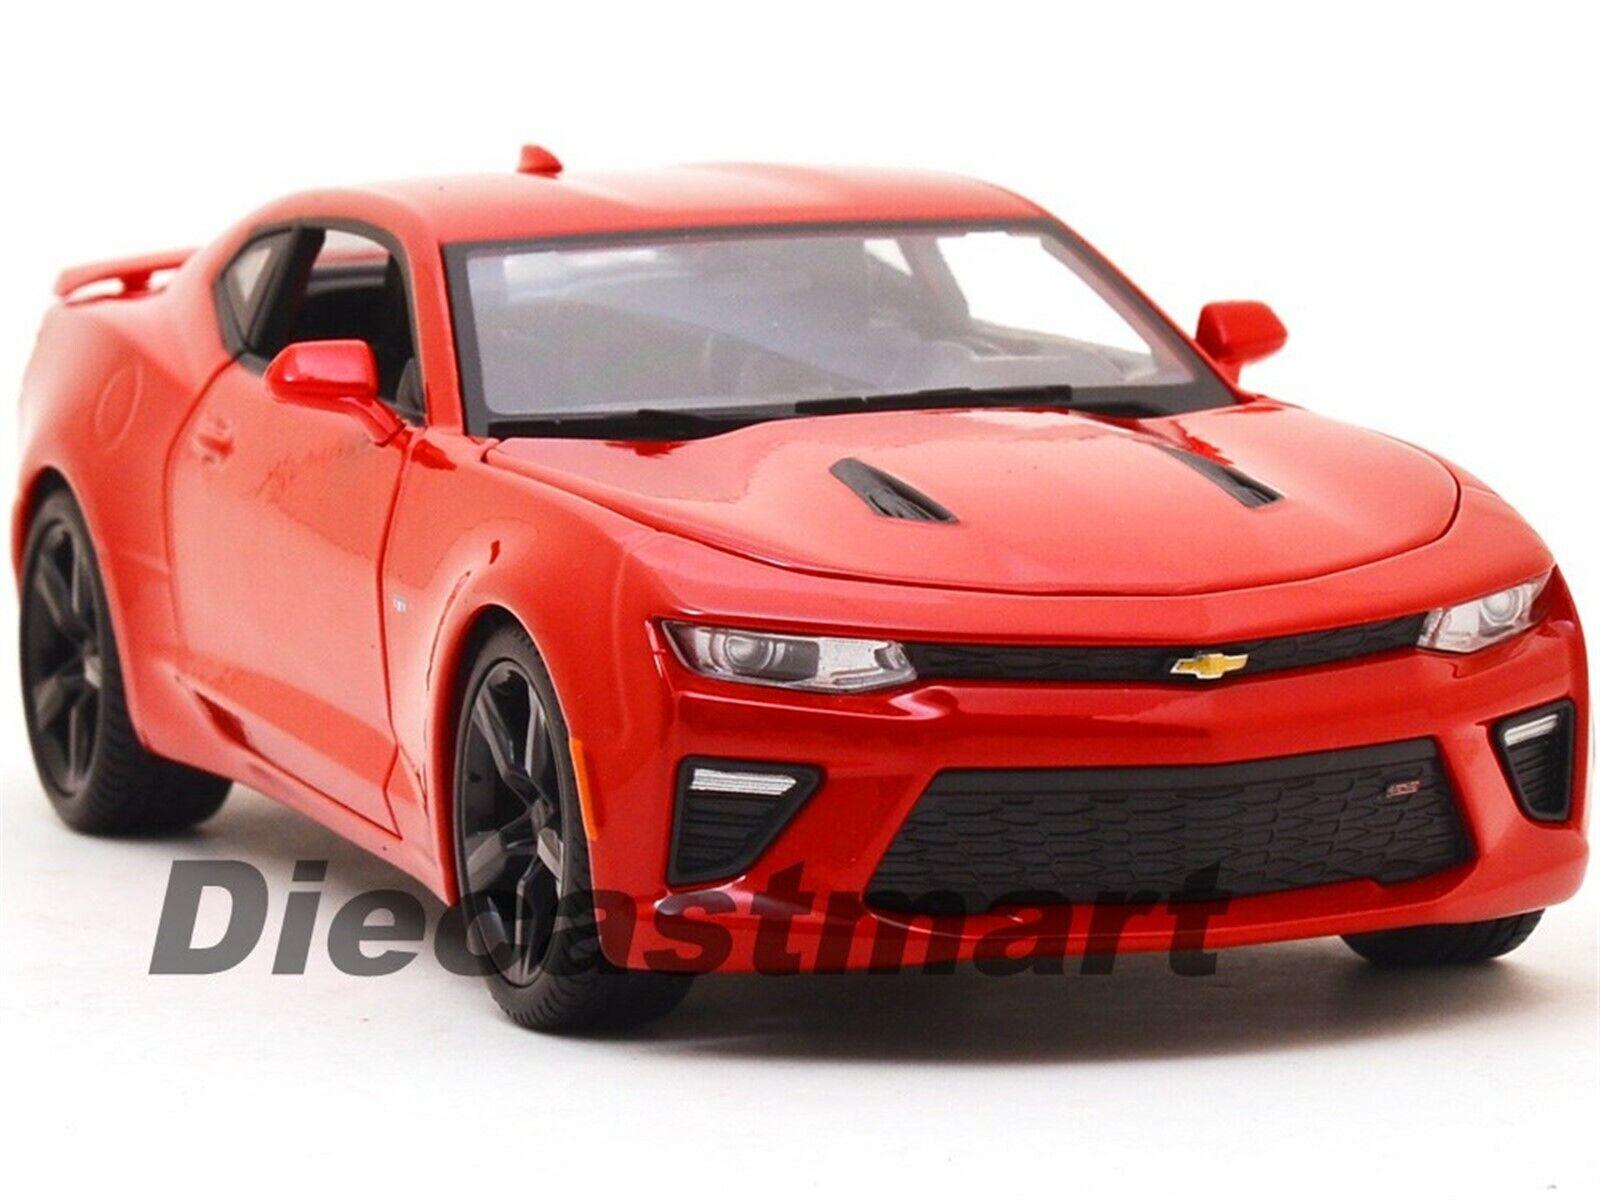 2016 CHEVROLET CAMARO SS RED DIECAST 1 18 MODEL CAR BY MAISTO 31689